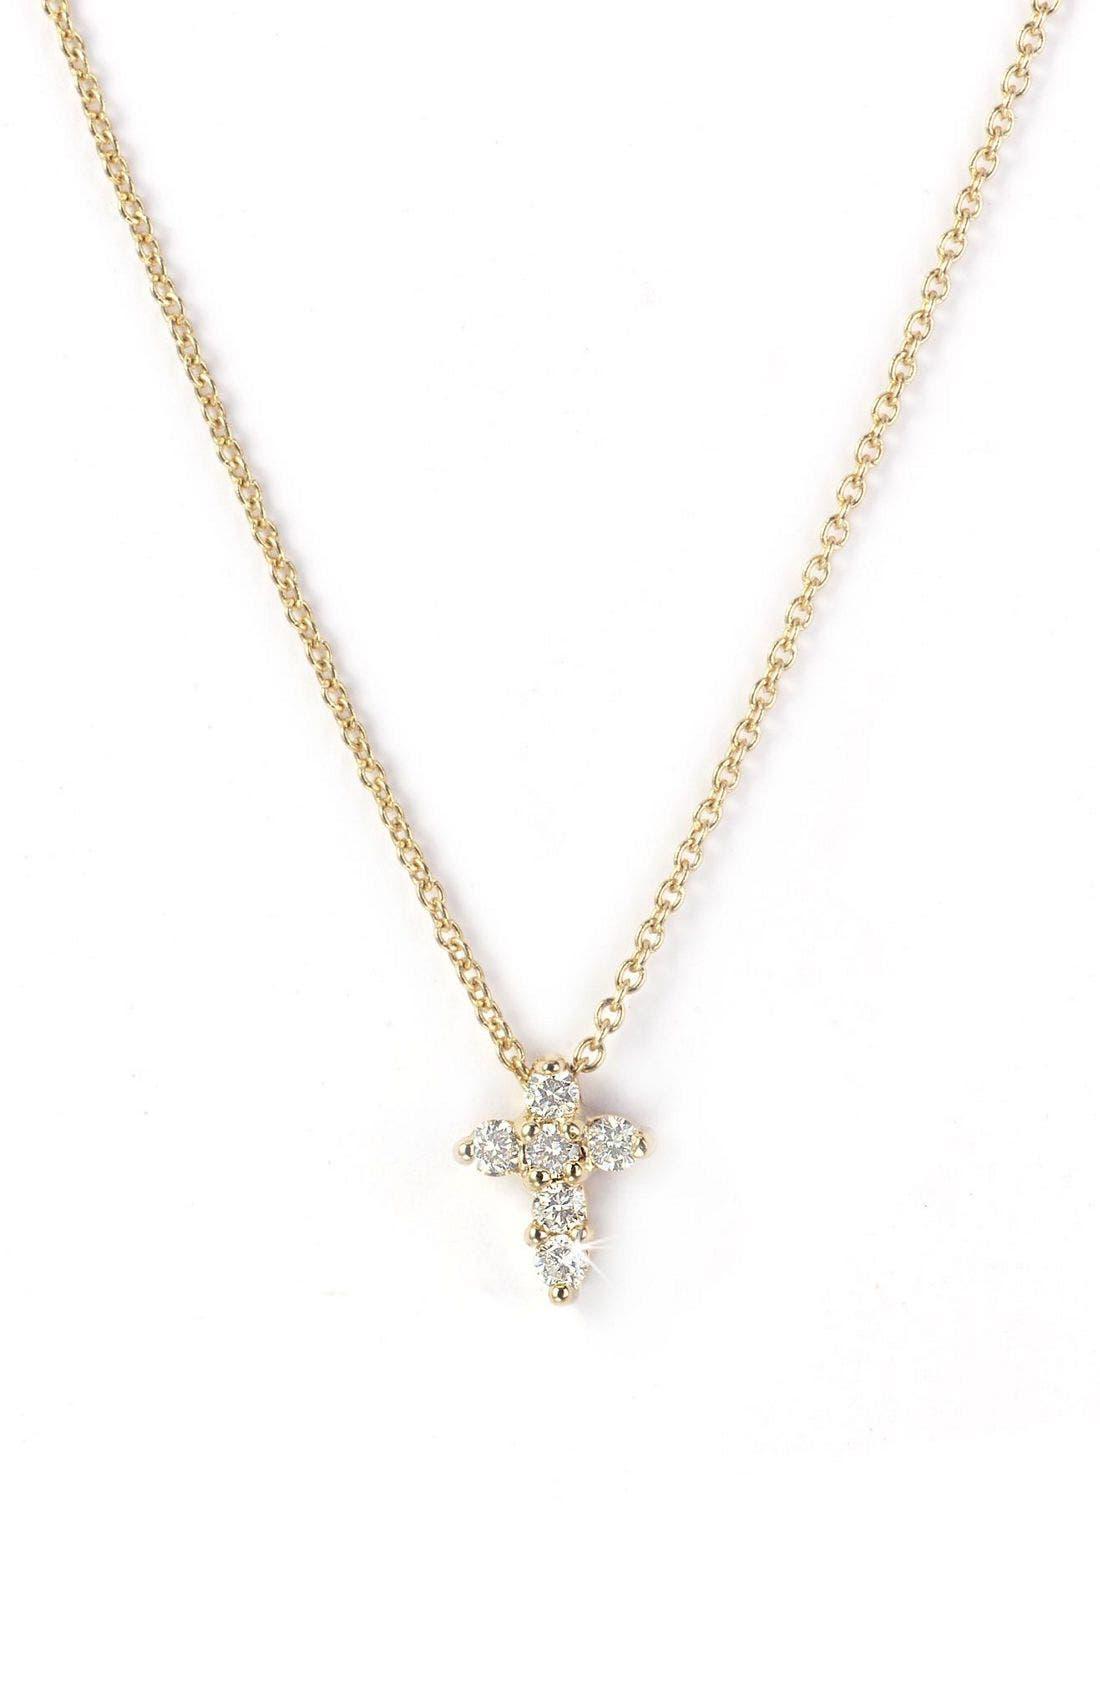 Alternate Image 1 Selected - Roberto Coin 'Tiny Treasures' Diamond Cross Pendant Necklace